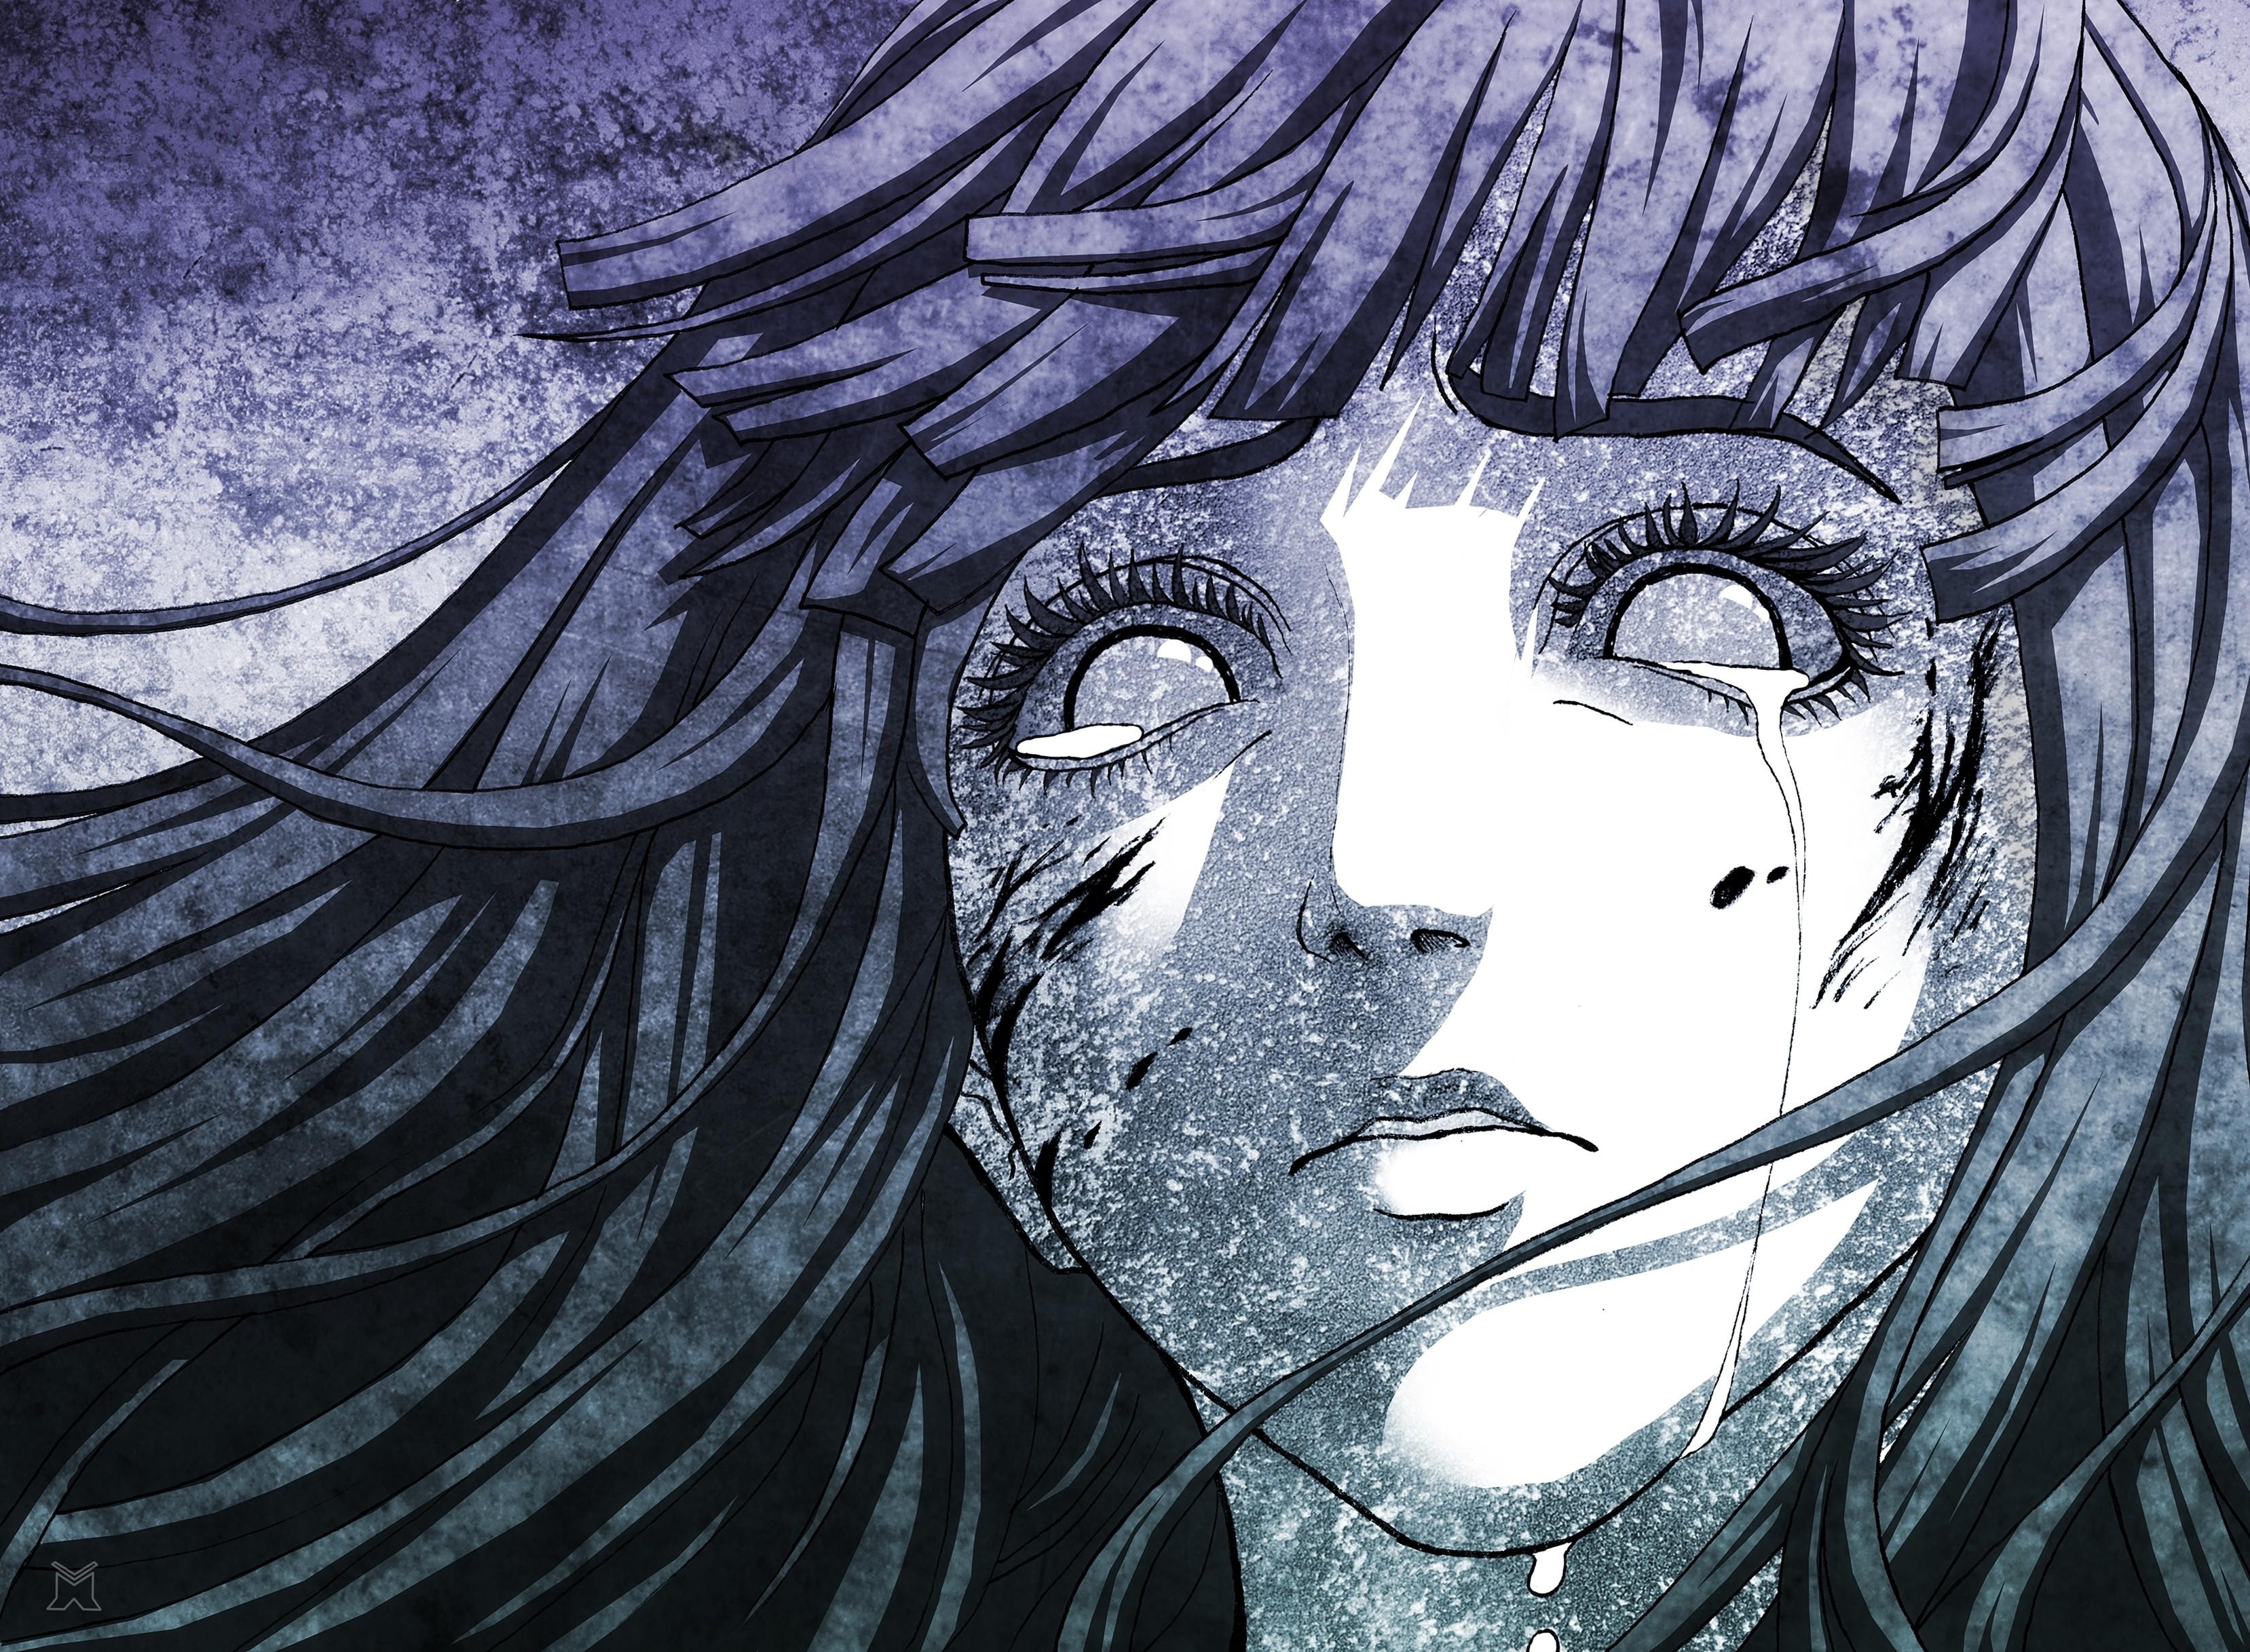 Anime 3315x2434 anime artwork anime girls Hyuuga Hinata Naruto Shippuuden crying monochrome face tears violet